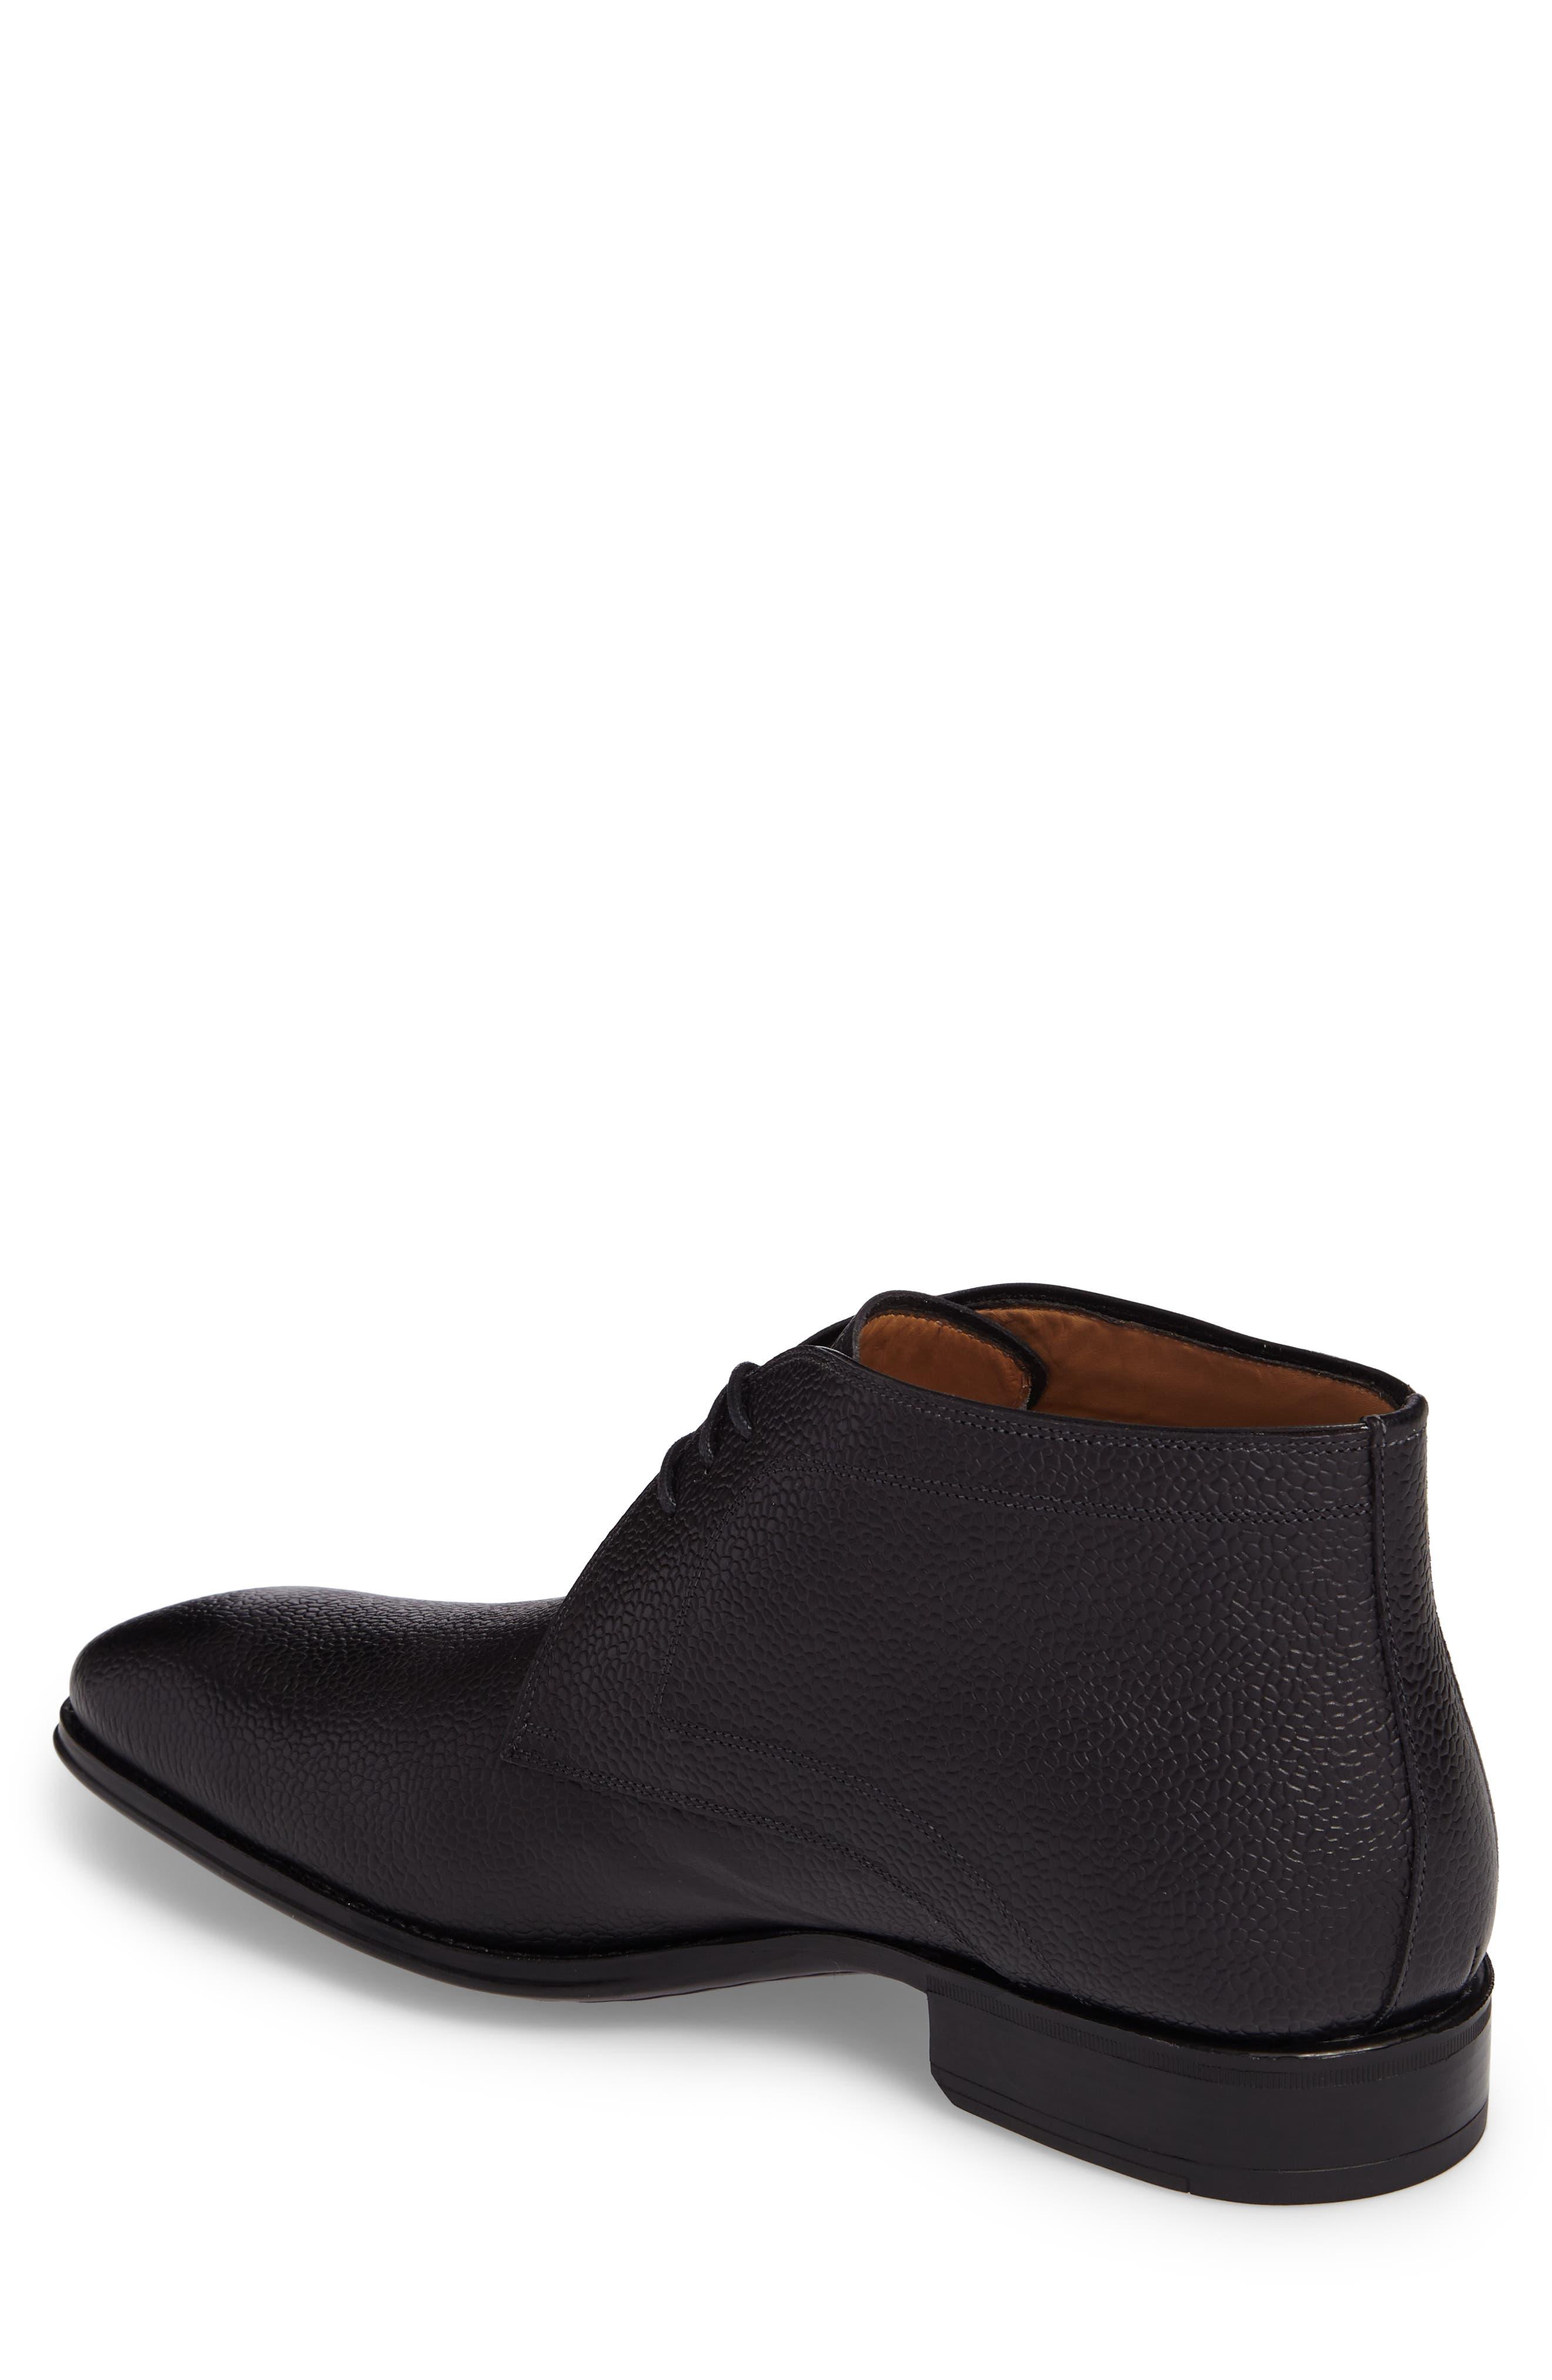 Cabra Plain Toe Derby,                             Alternate thumbnail 2, color,                             BLACK LEATHER